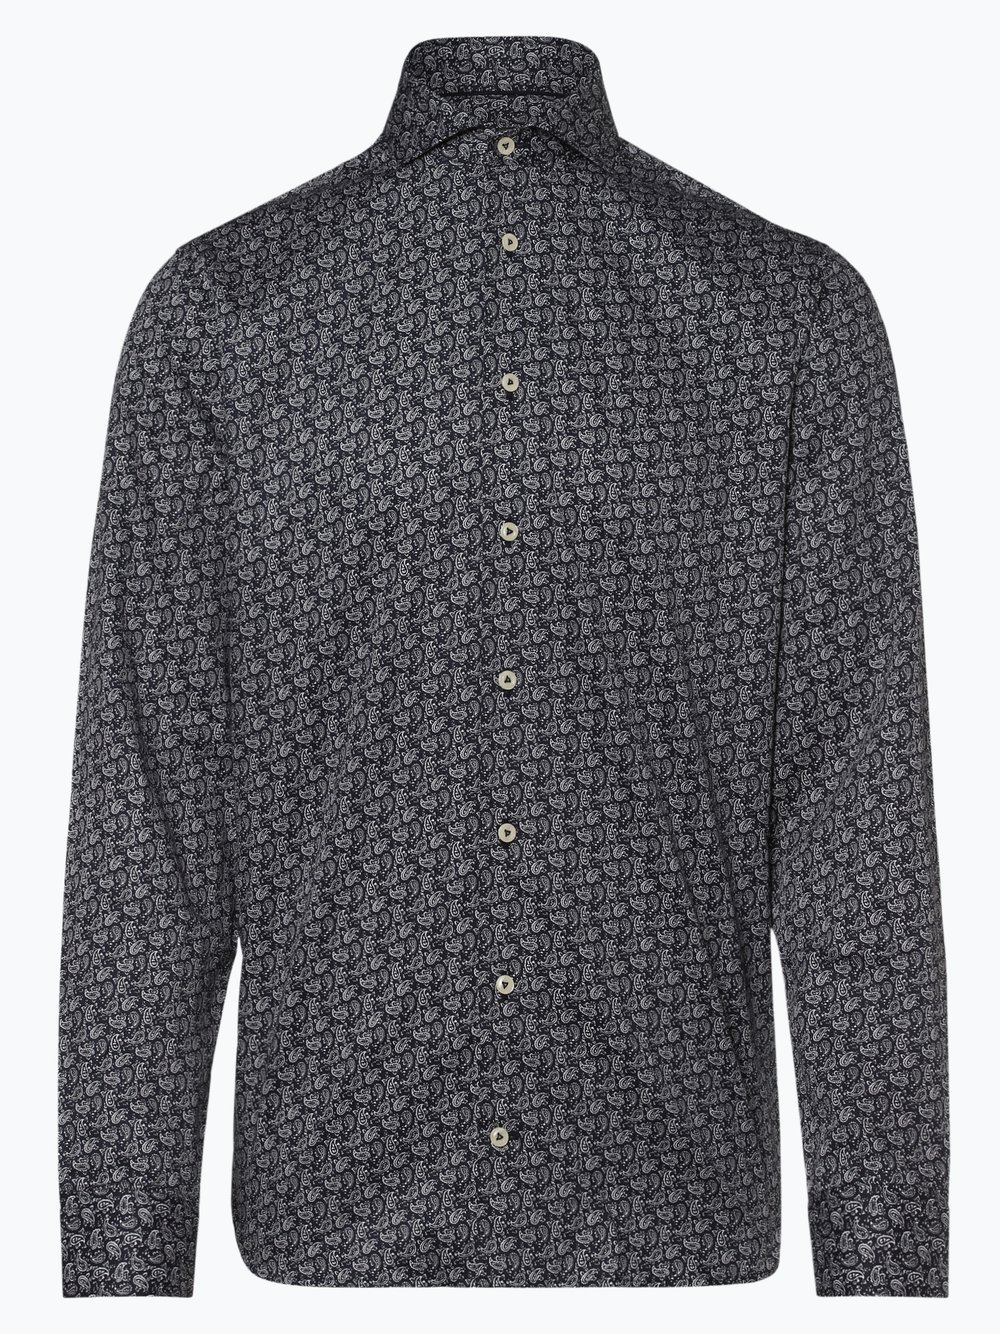 Van Laack – Koszula męska, niebieski Van Graaf 444146-0001-00450